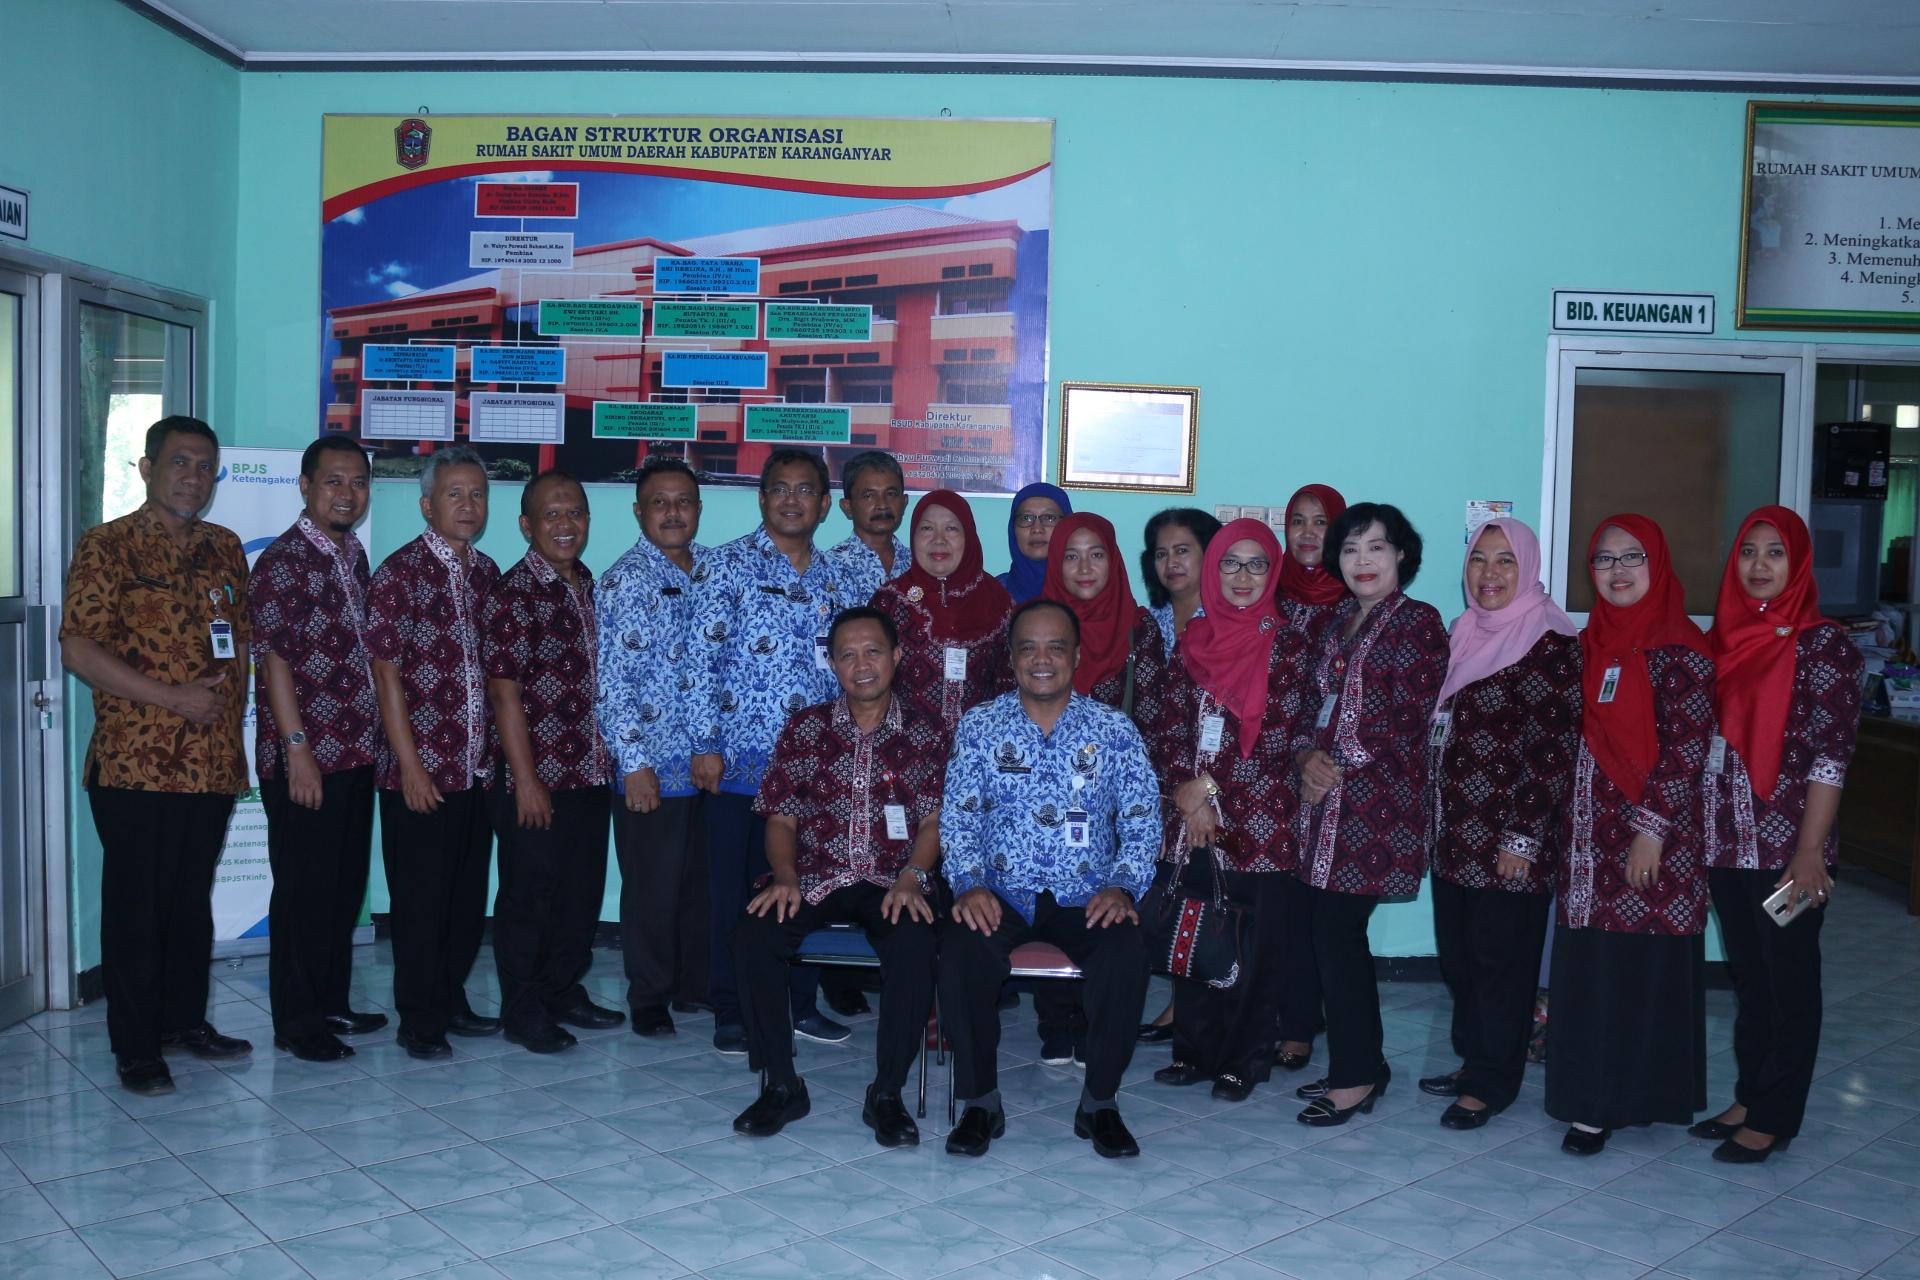 RSUD dr R Goeteng Taroenadibrata lanjutkan kaji banding di RSUD Kabupaten Karanganyar